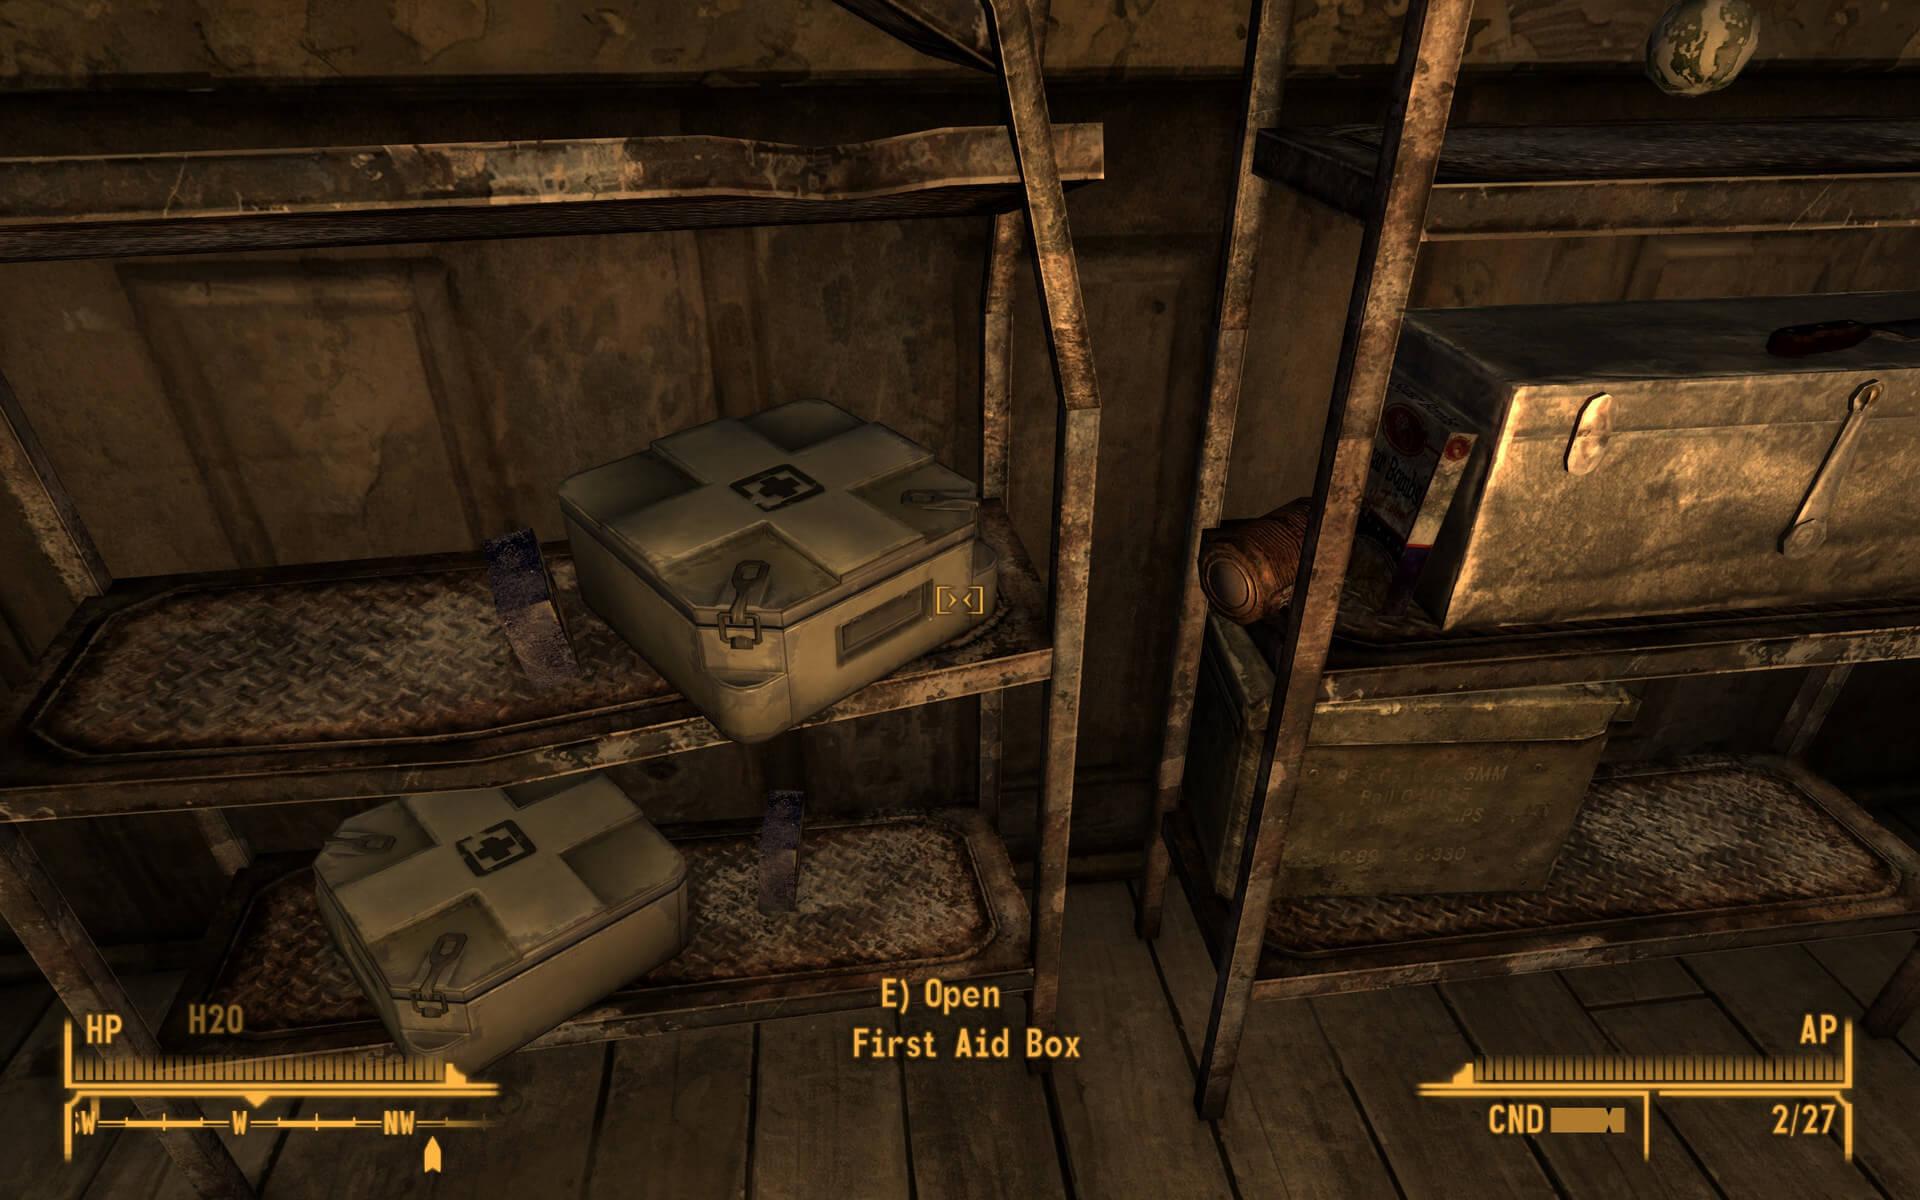 Для Fallout New Vegas вышел мод с большим паком 4X HD-текстур, объемом 16 ГБ